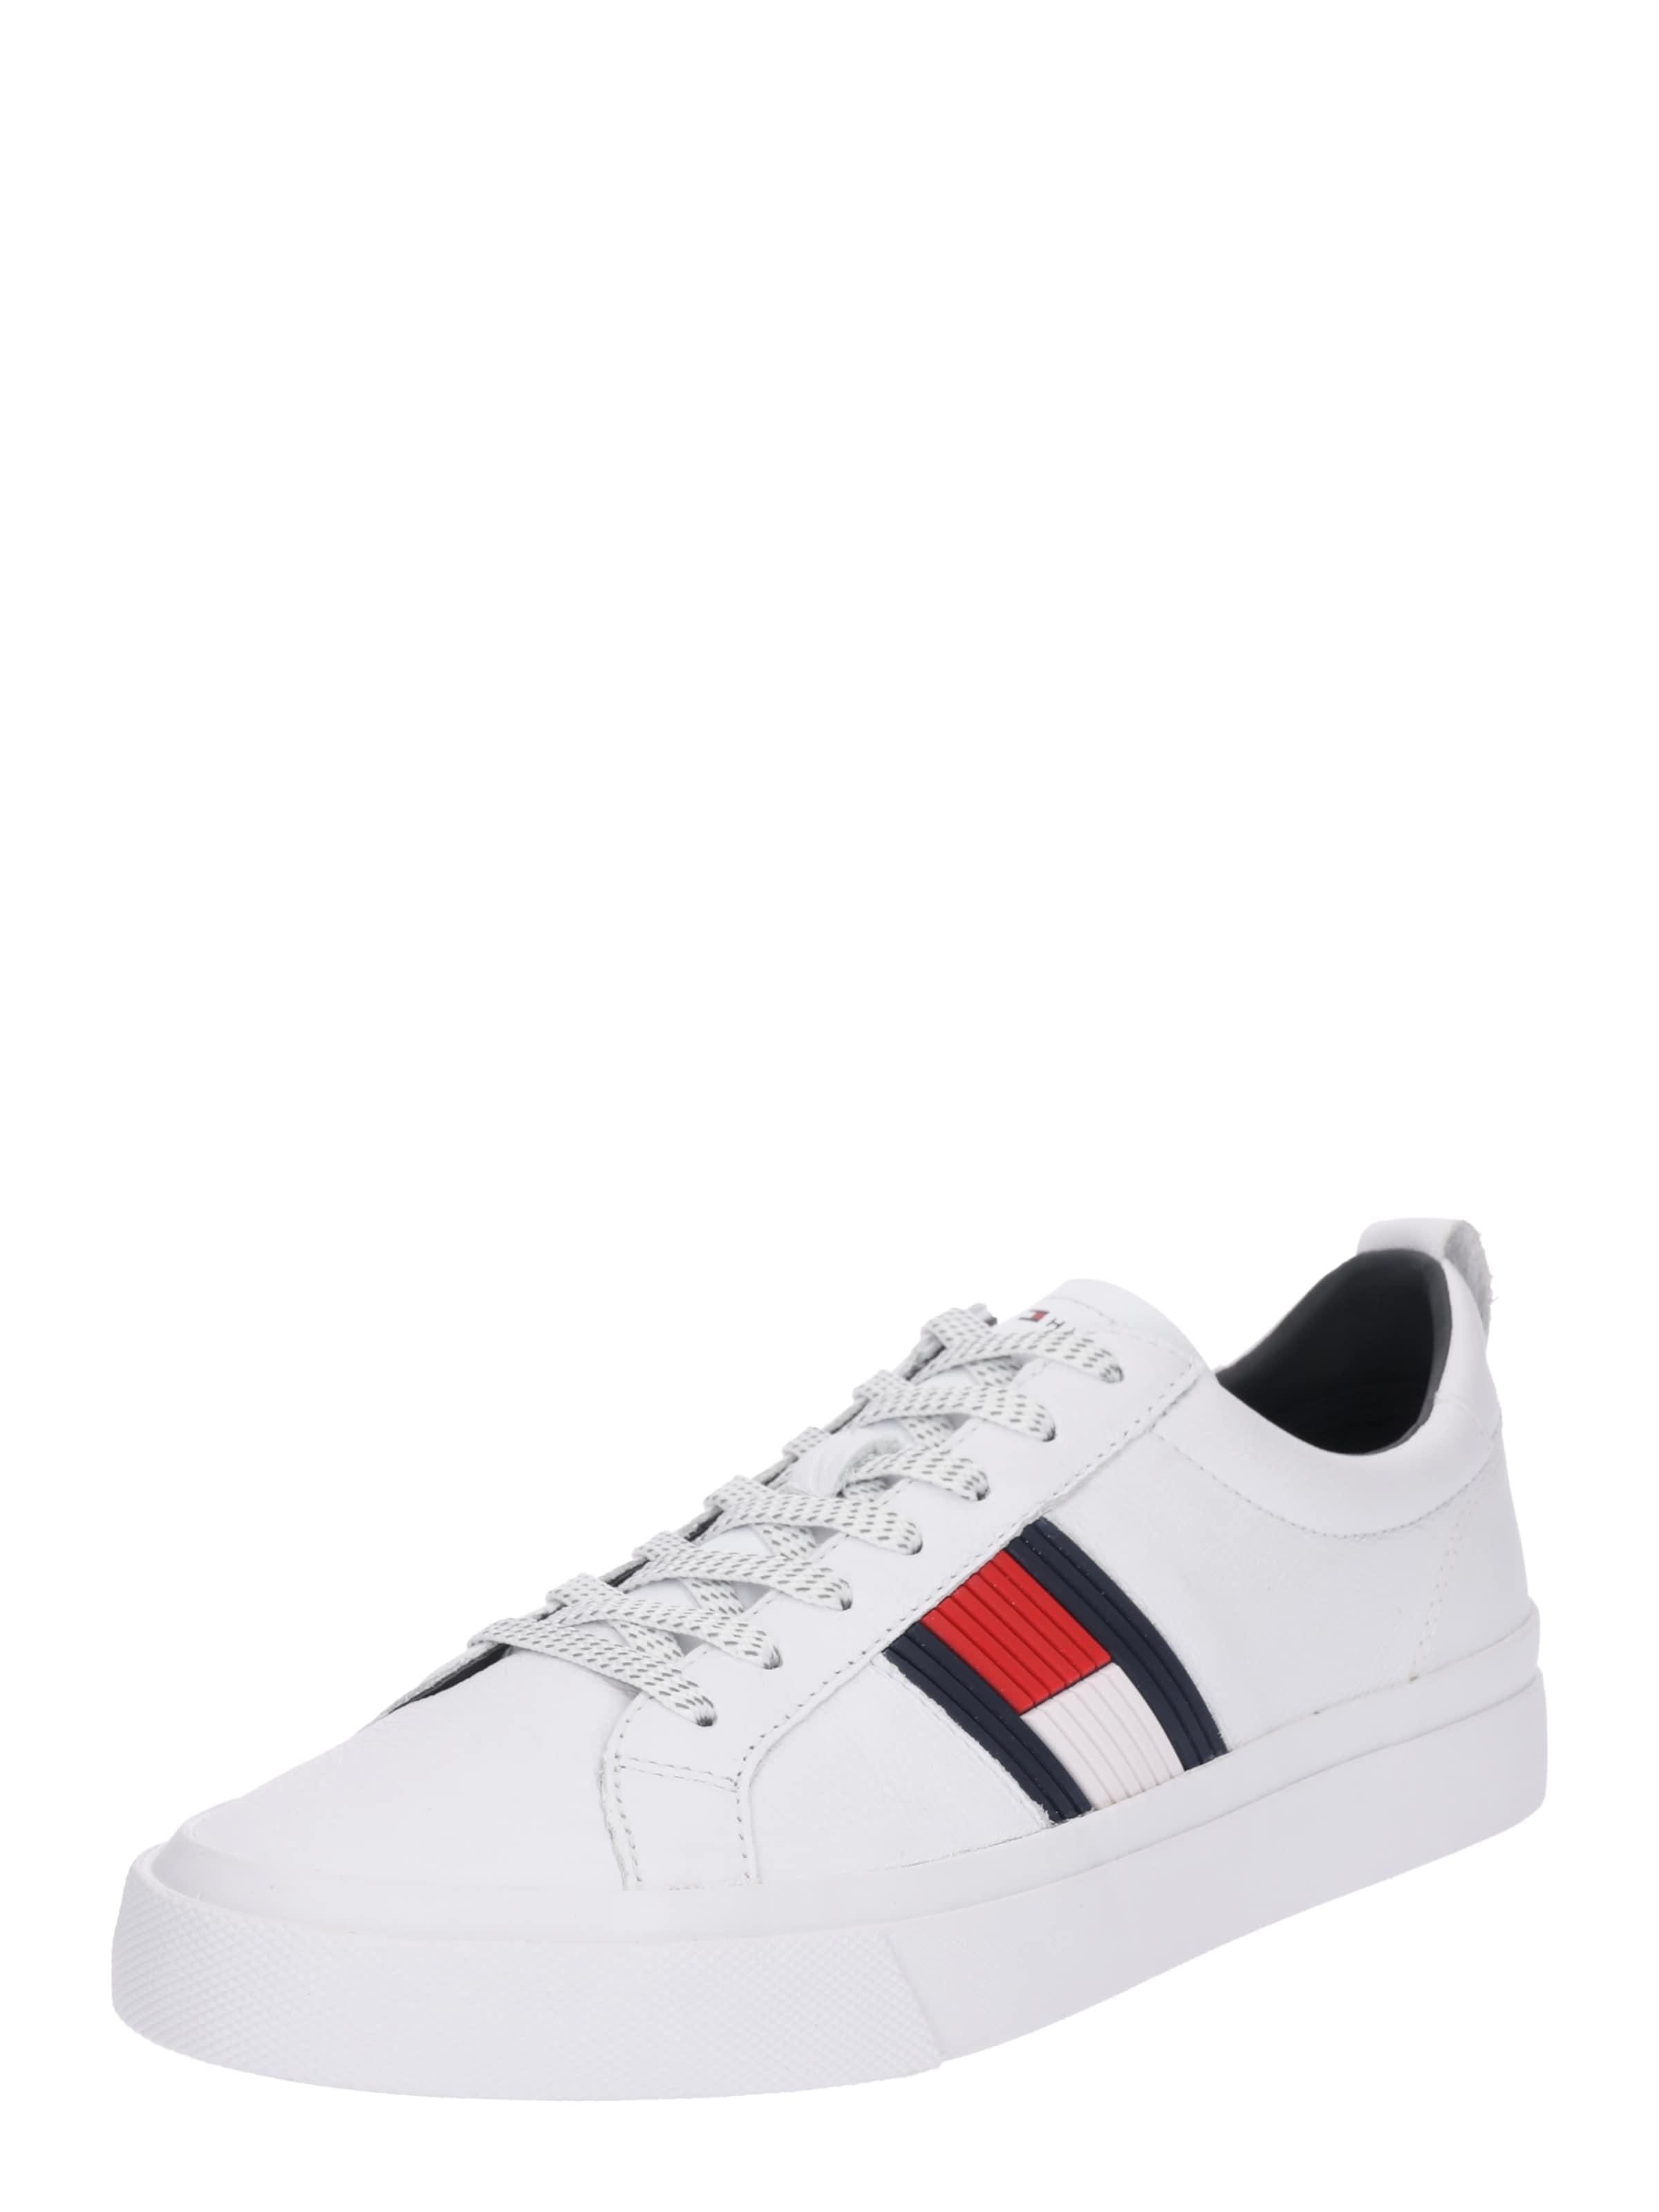 TOMMY HILFIGER Sneaker Low Günstige und langlebige Schuhe